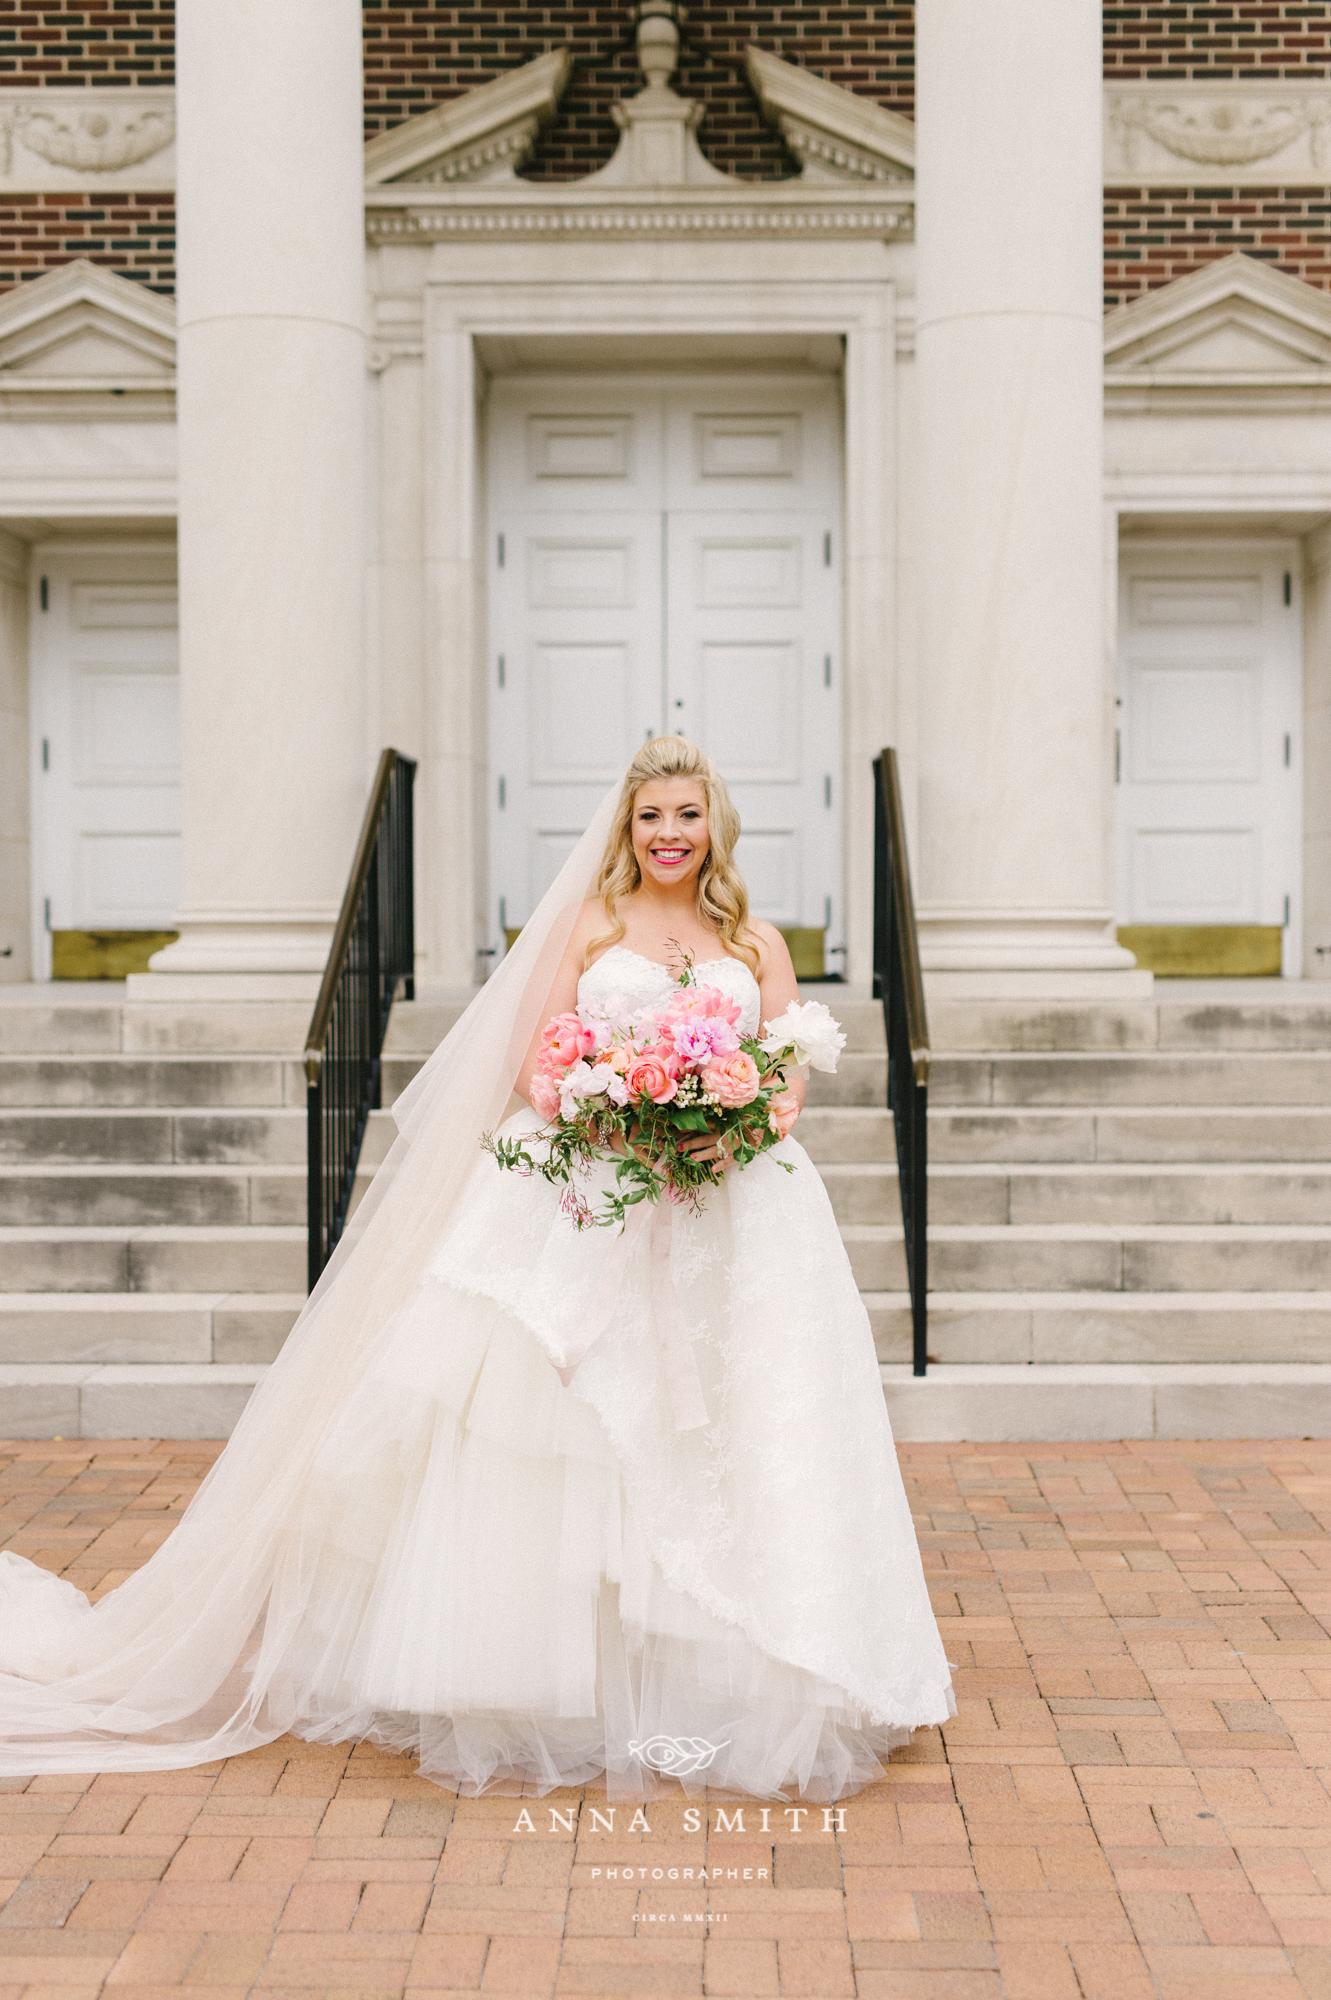 web 17- 4-W-CD-heather brandon wedding perkins adolphus-210.jpg